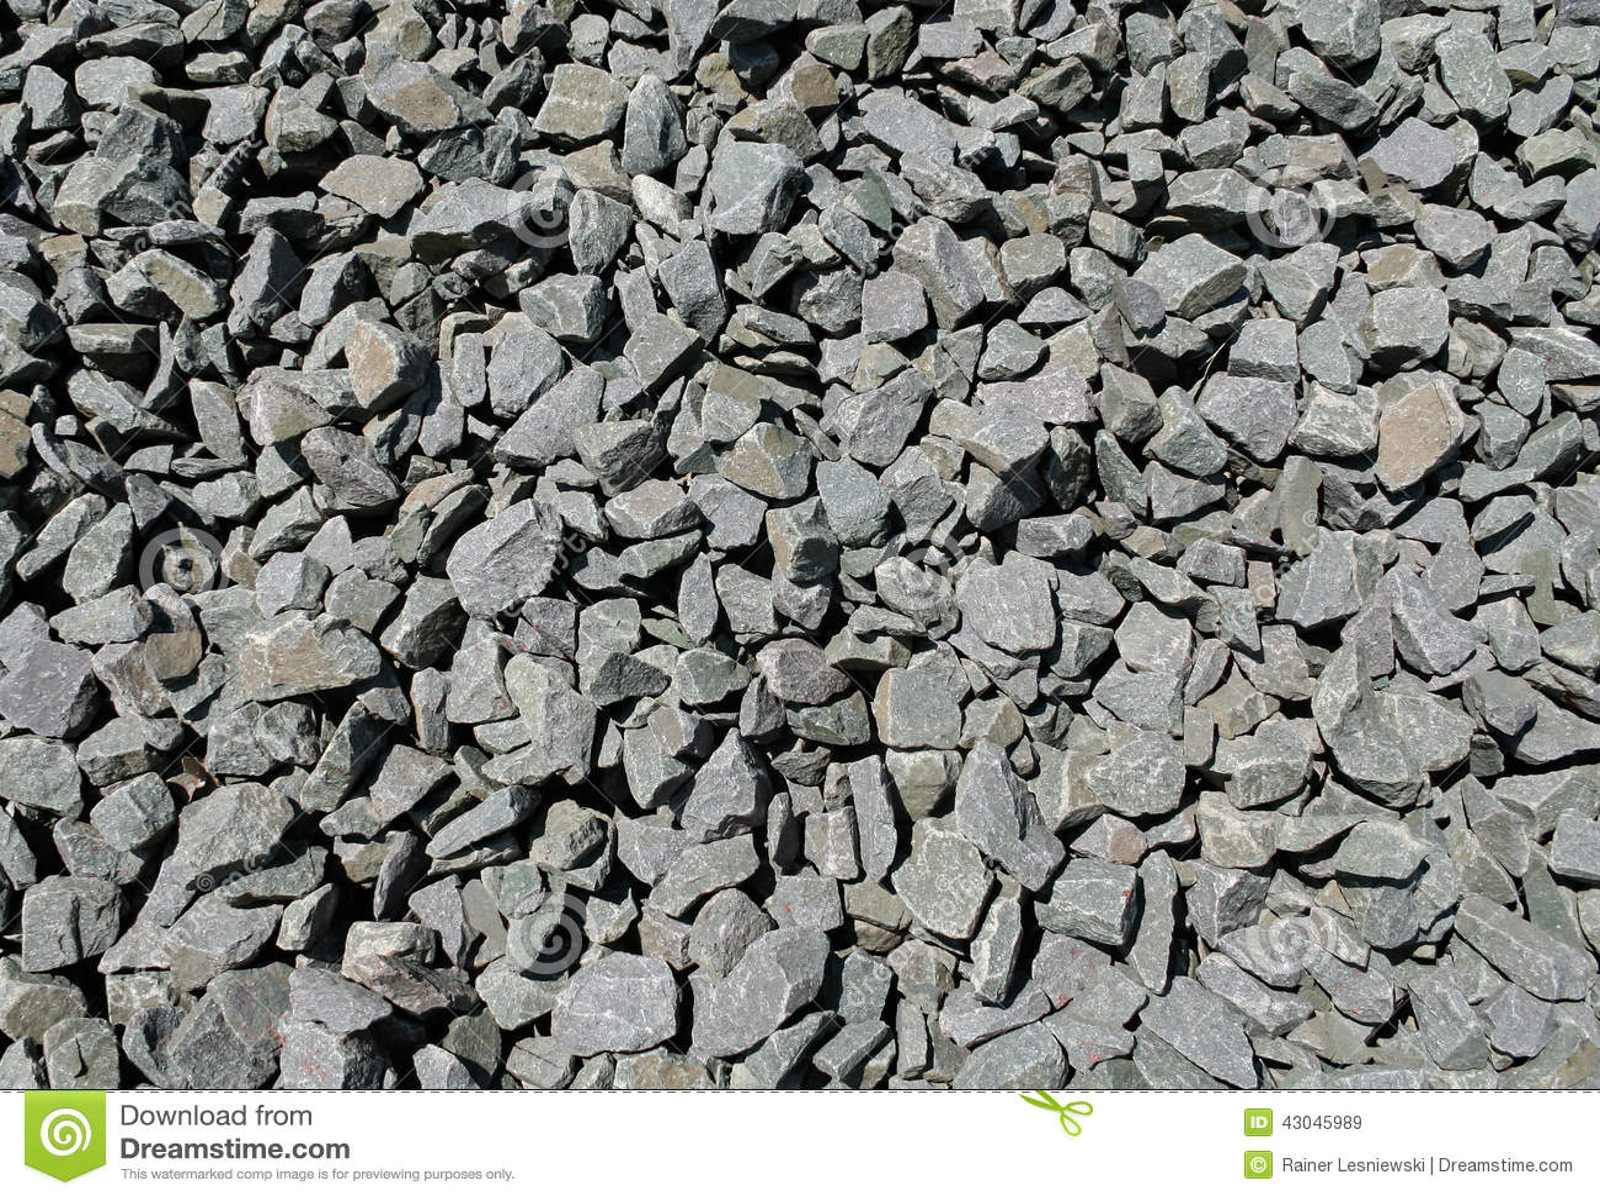 Black Crushed Rock : Crushed basalt stock photo image